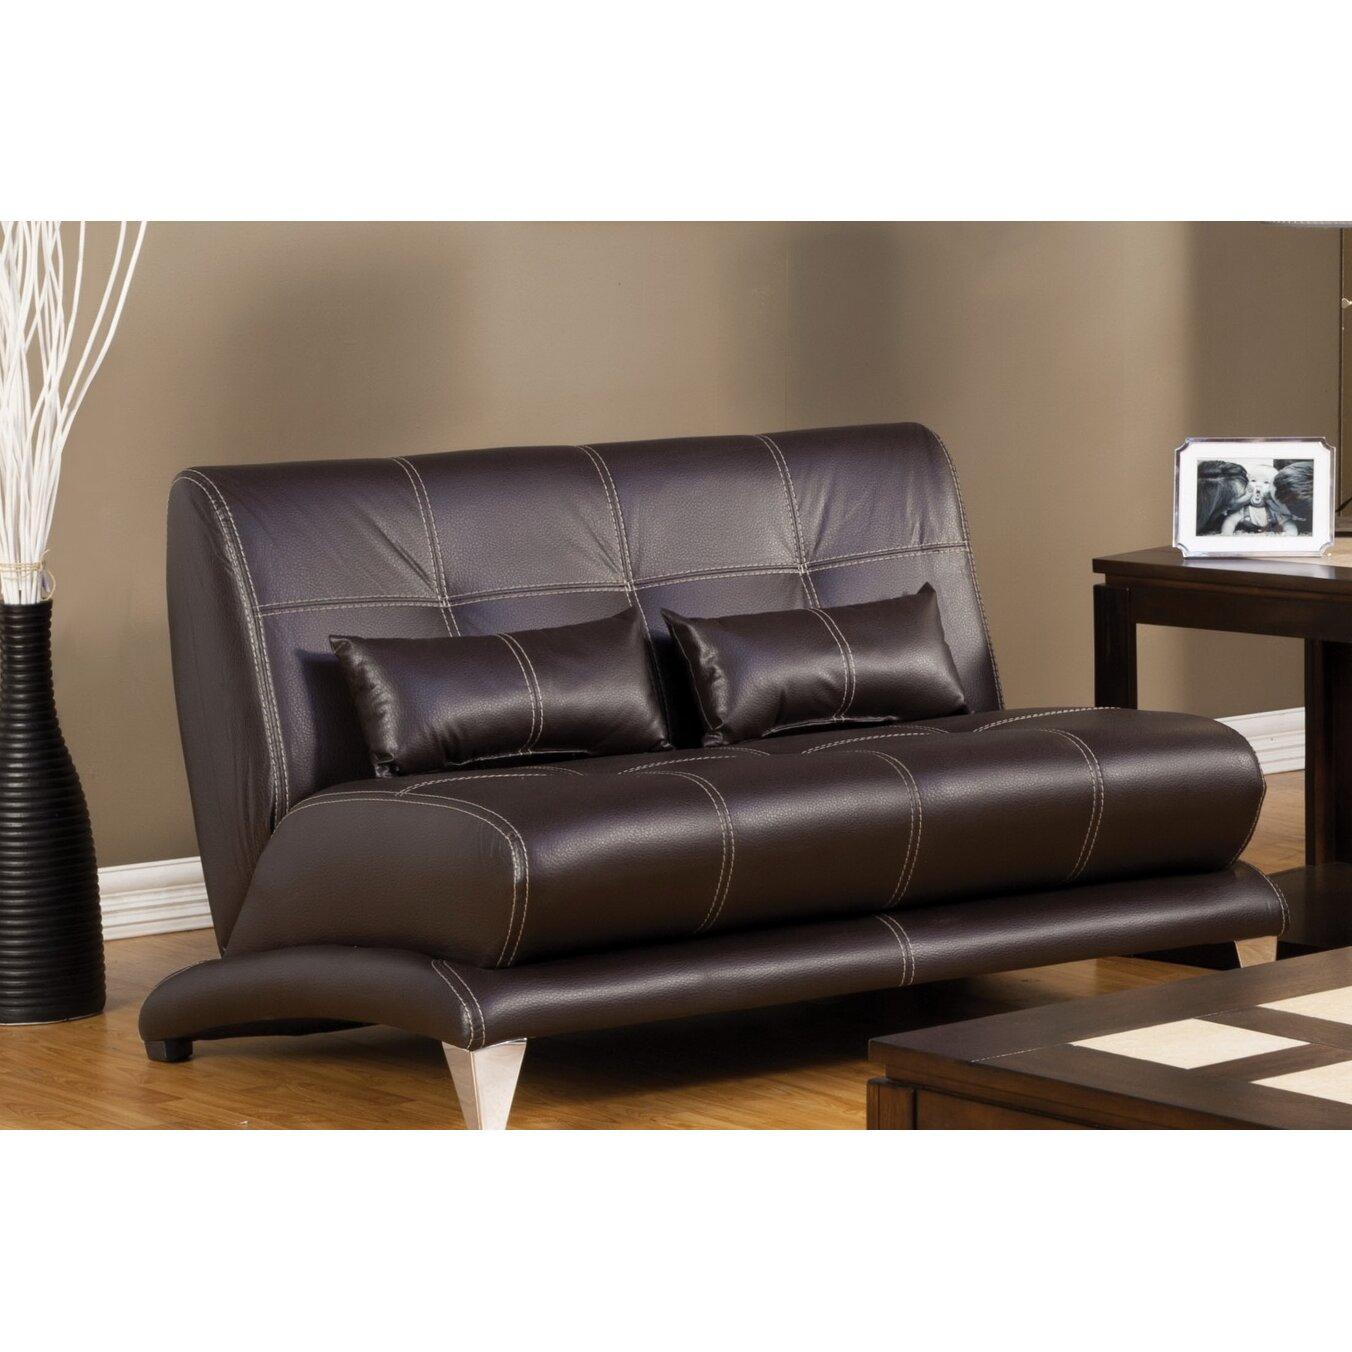 Hokku designs sewell living room collection reviews for Hokku designs living room furniture